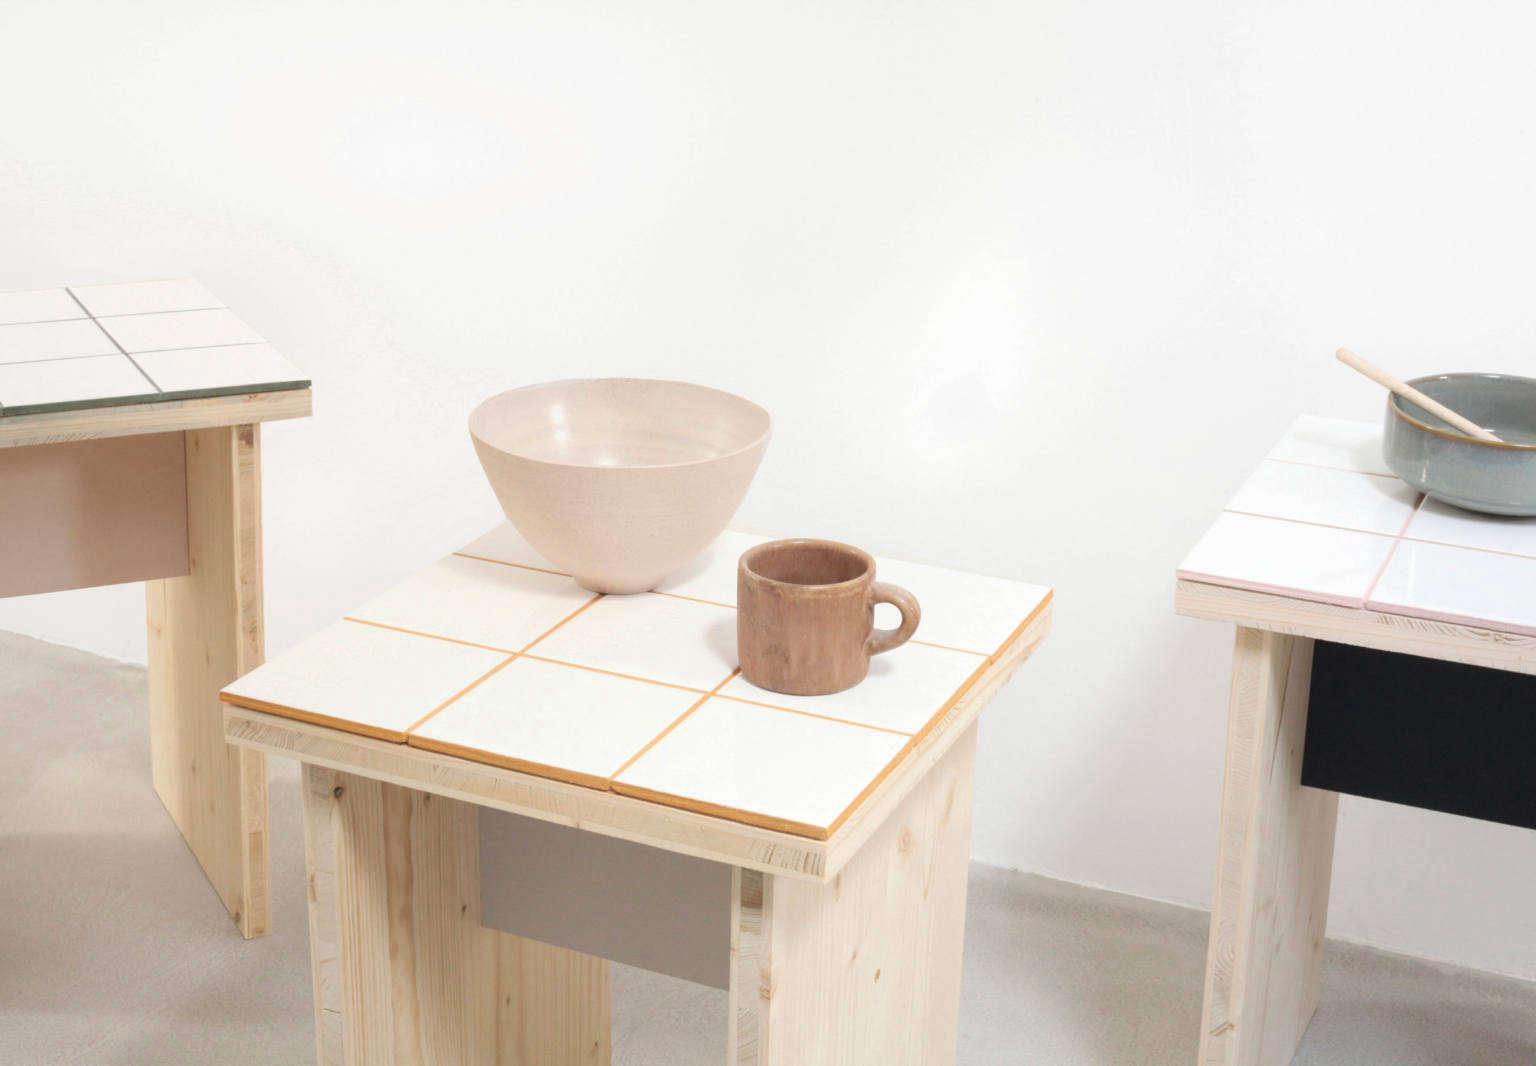 diy tiled stool side table heju 2 1536x1066